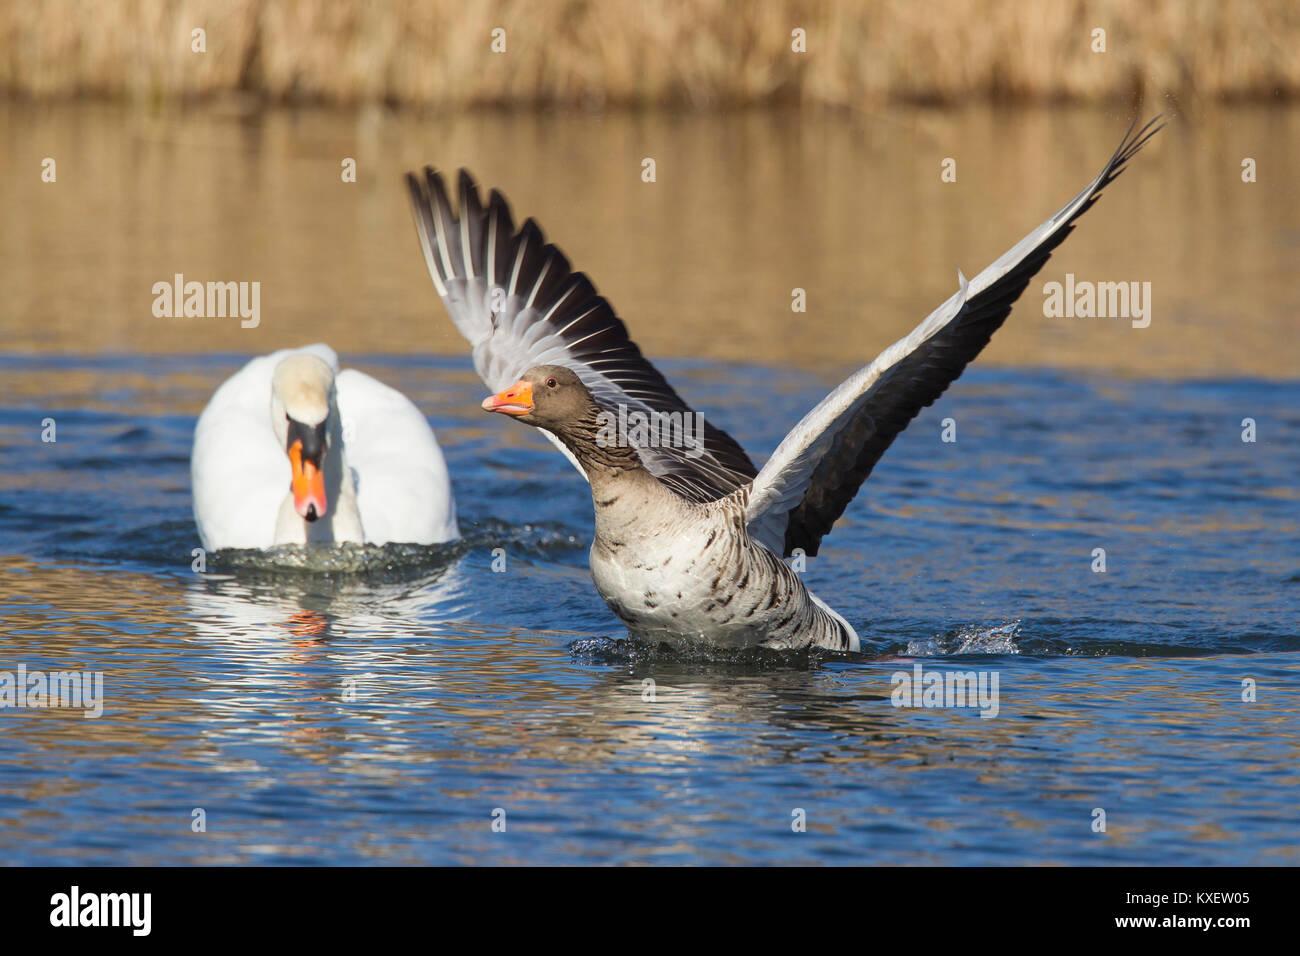 Territoriale Höckerschwan (Cygnus olor) weg jagen Graugans/Graugans (Anser anser) Schwimmen im See Stockbild